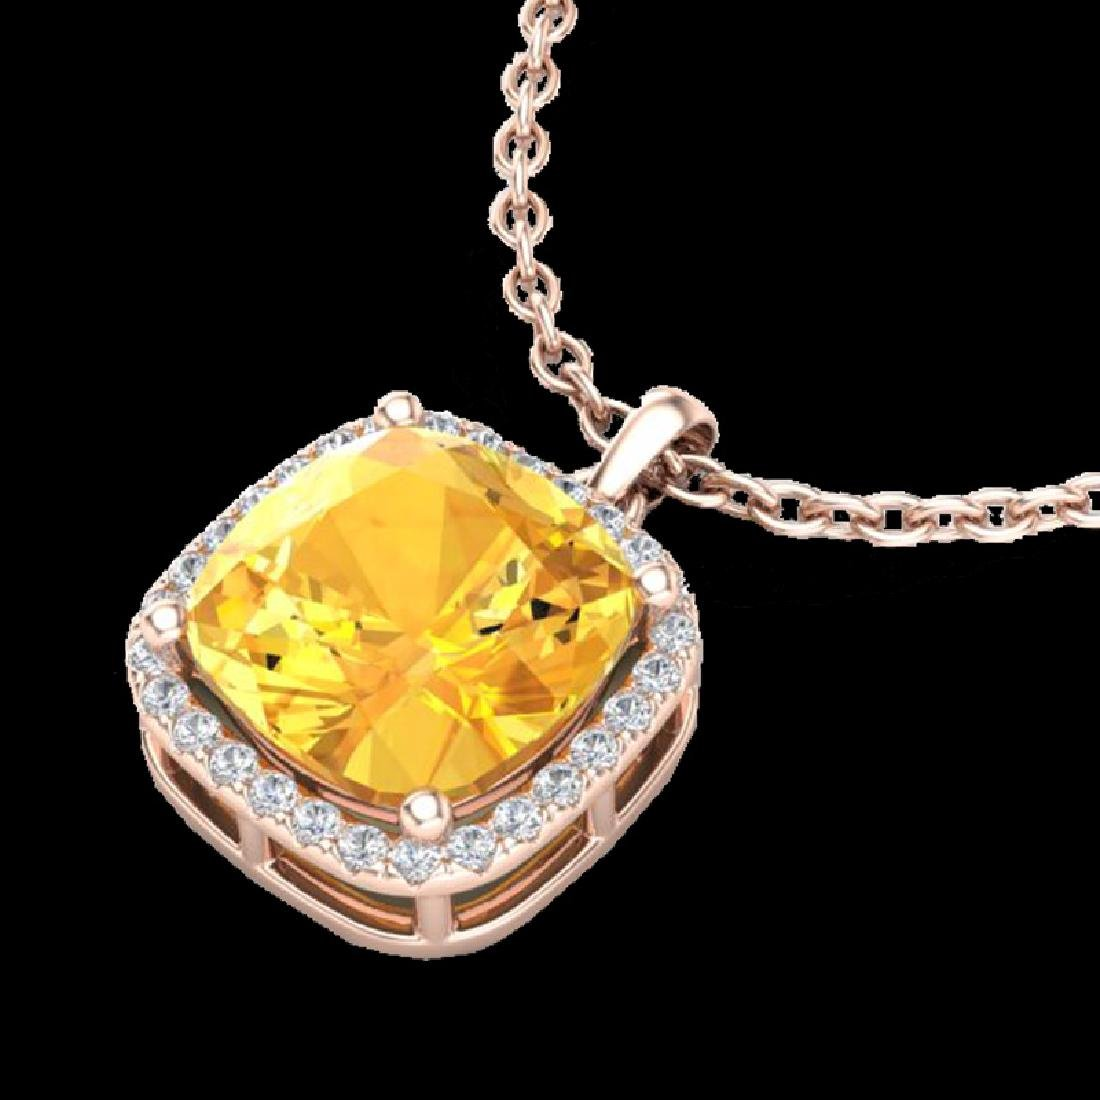 6 CTW Citrine & Micro Pave Halo VS/SI Diamond Necklace